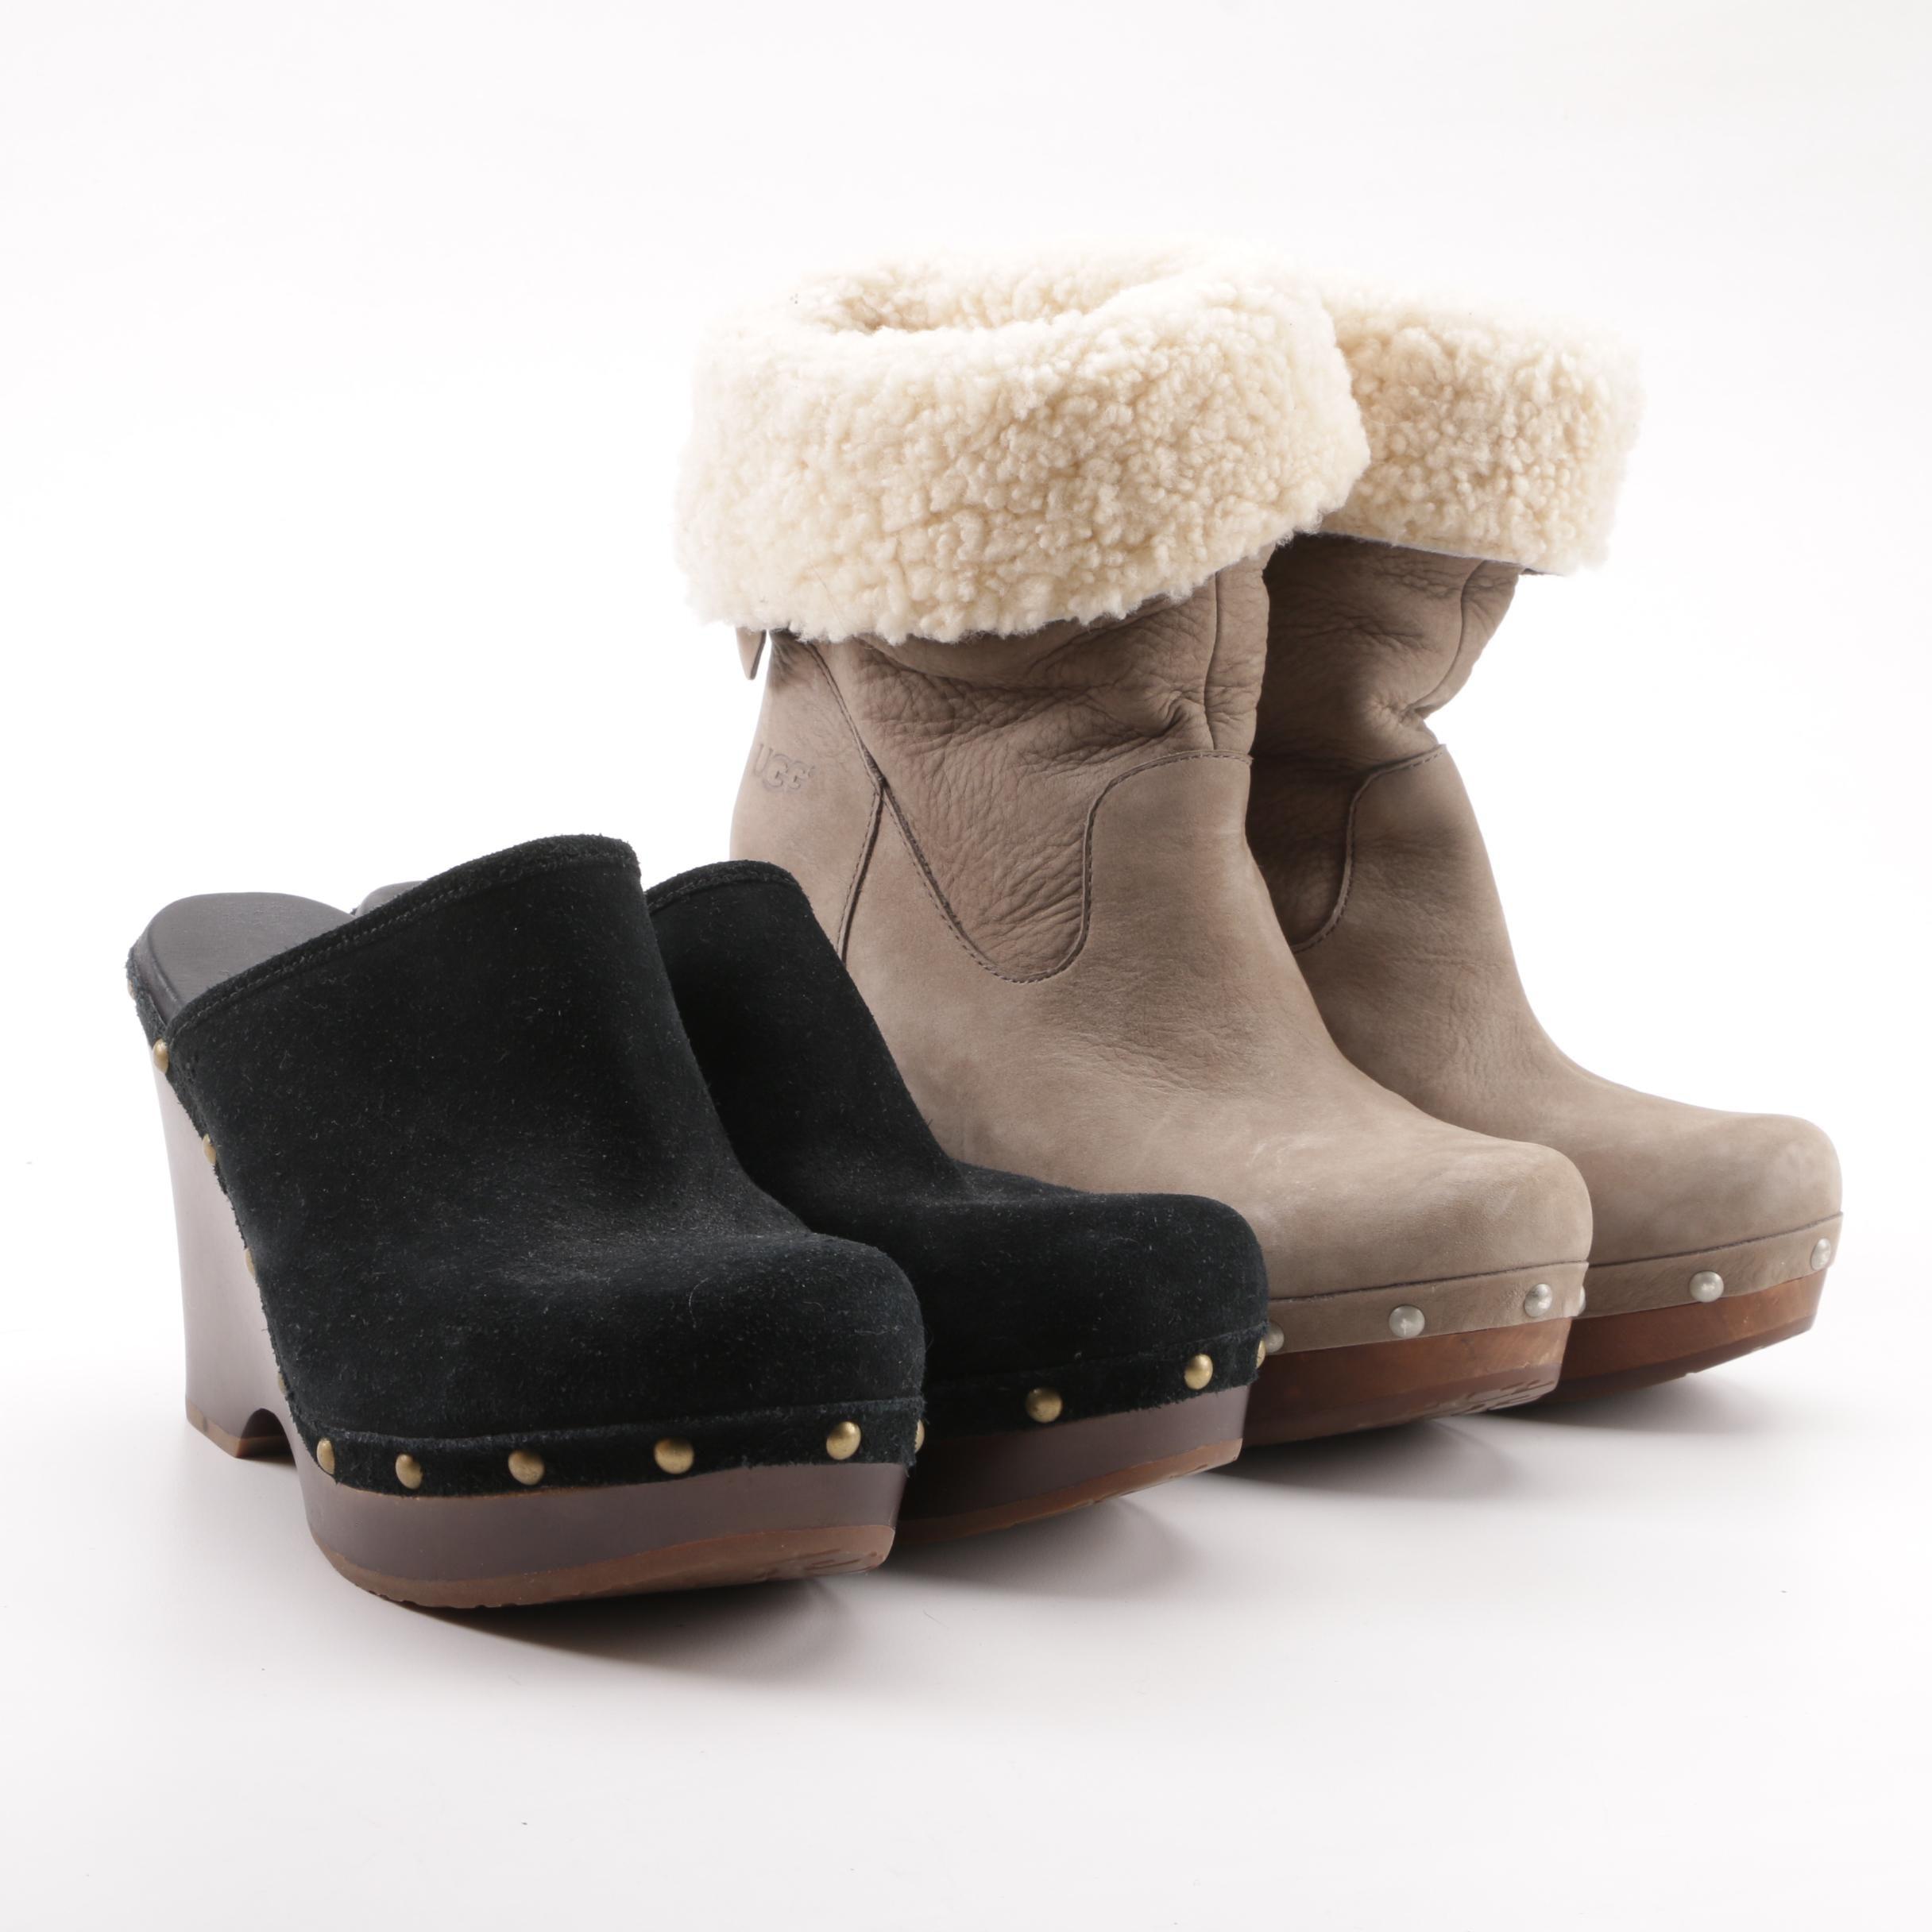 Women's Ugg Sheepskin Booties and Suede Clogs